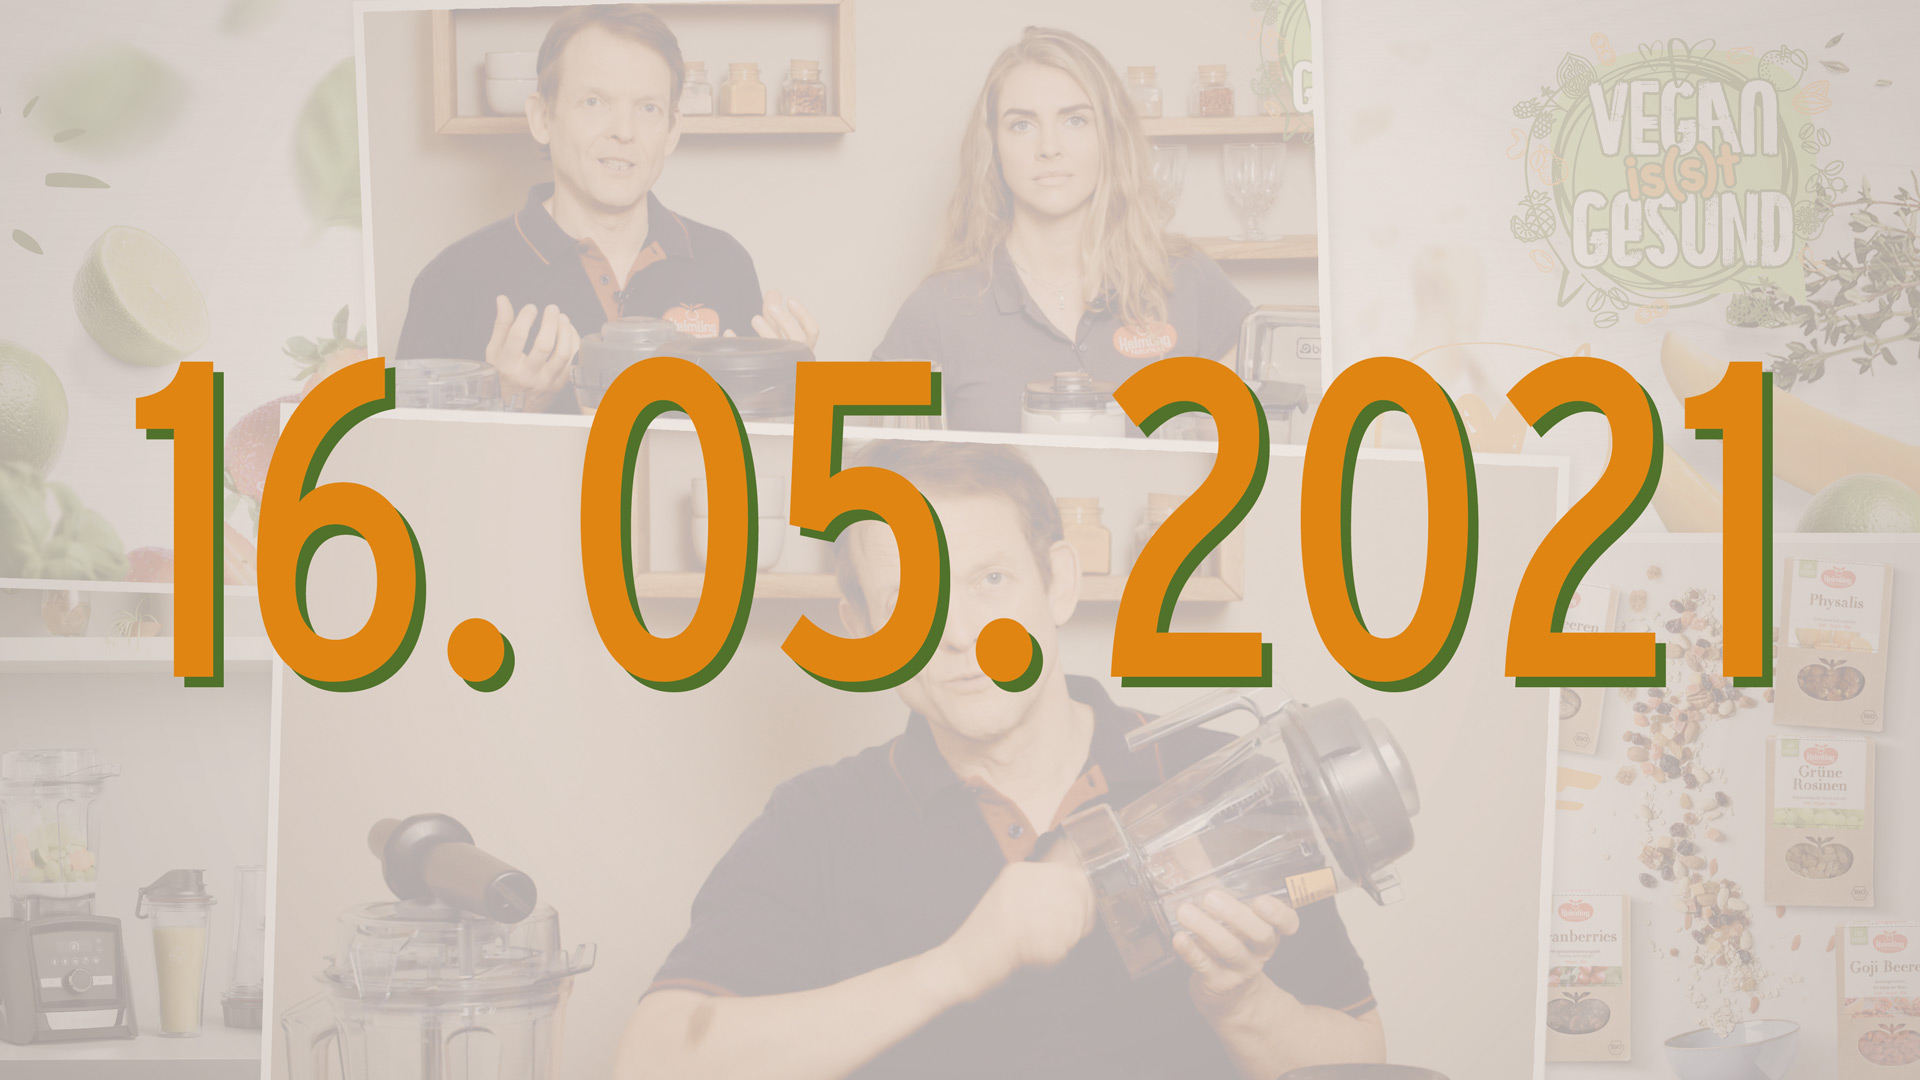 Video-Start 16.05.2021